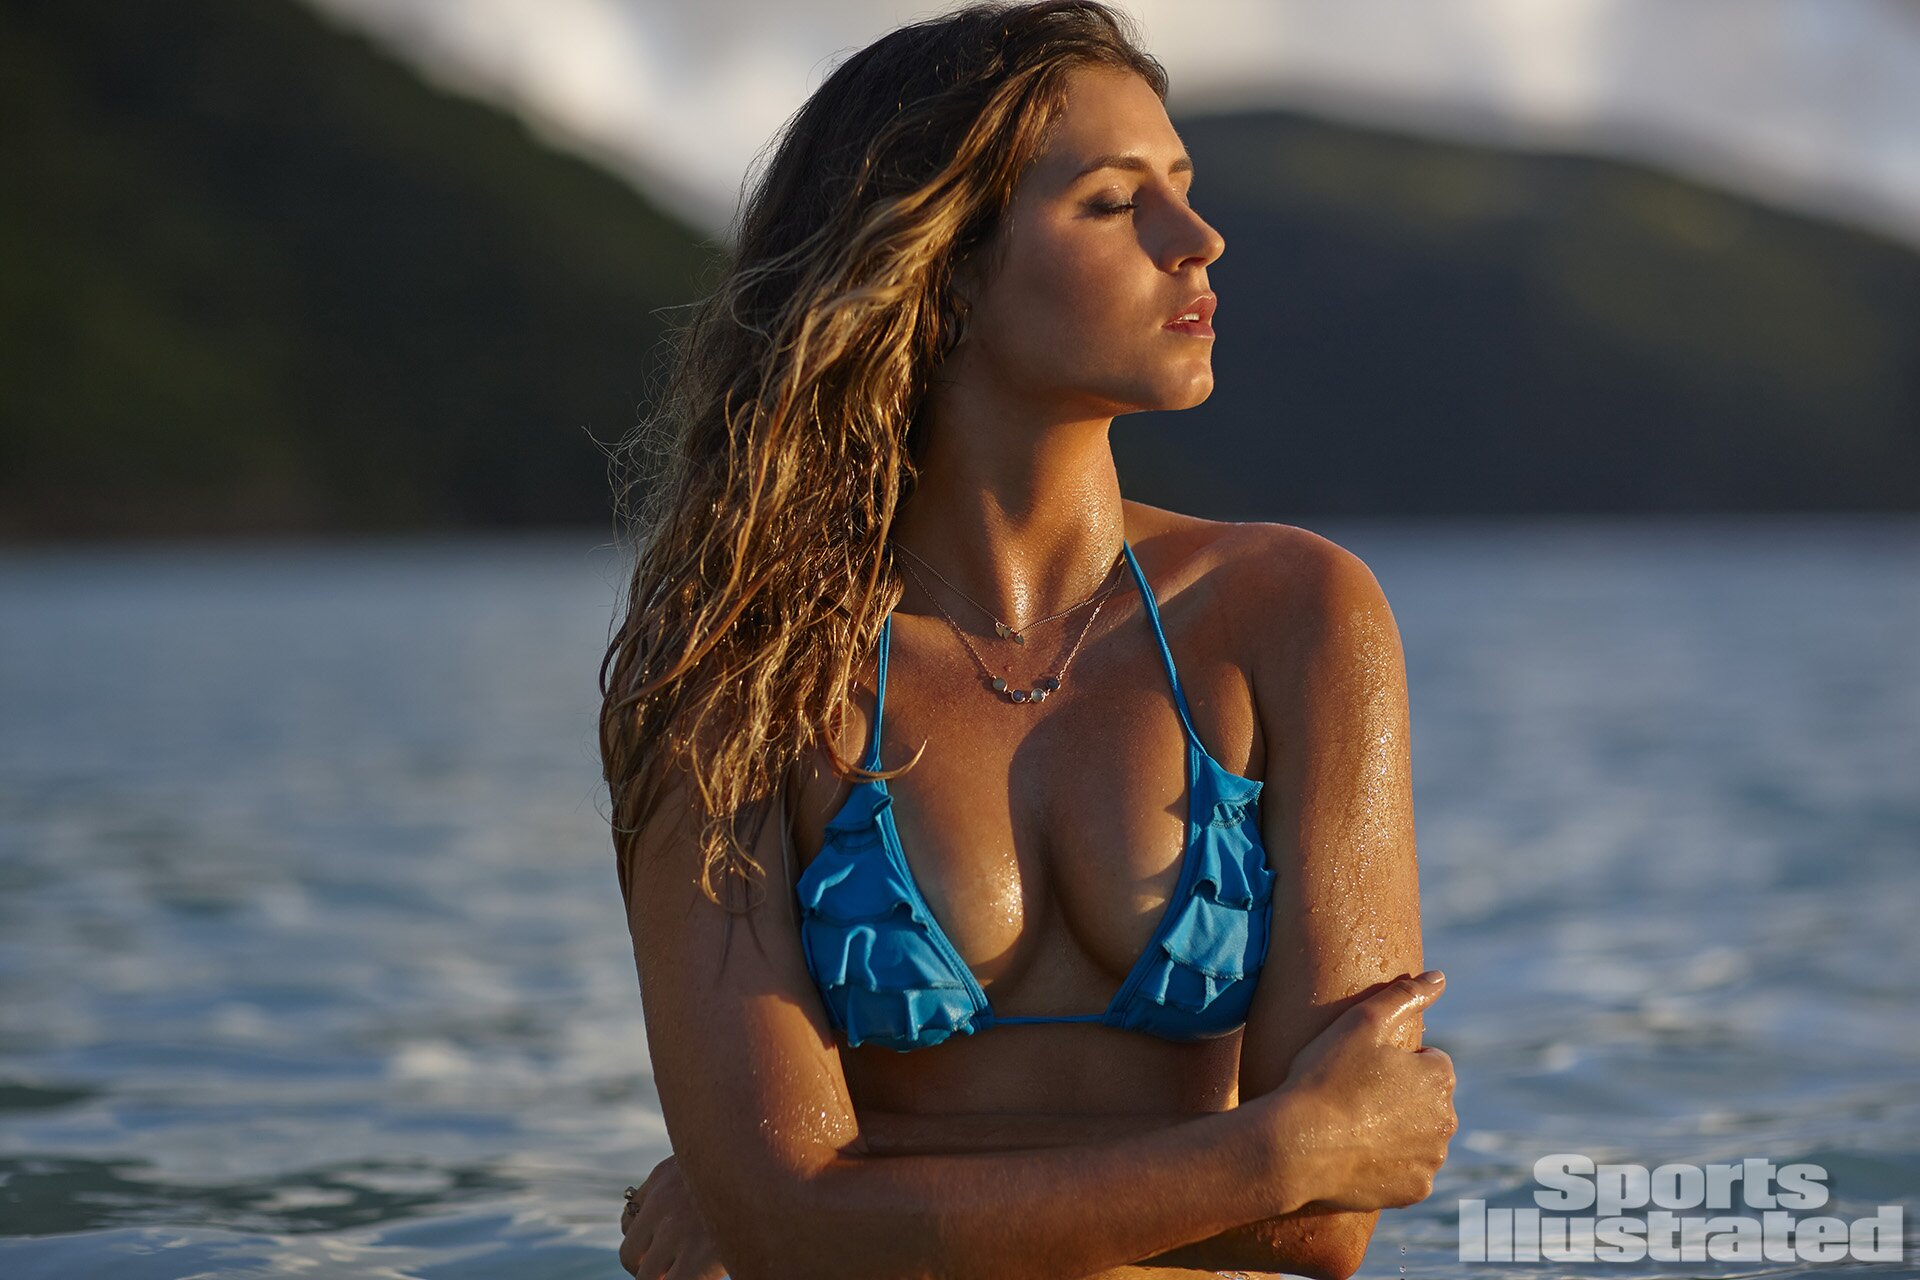 Anastasia Ashley 2014: Guana Island, British Virgin Islands